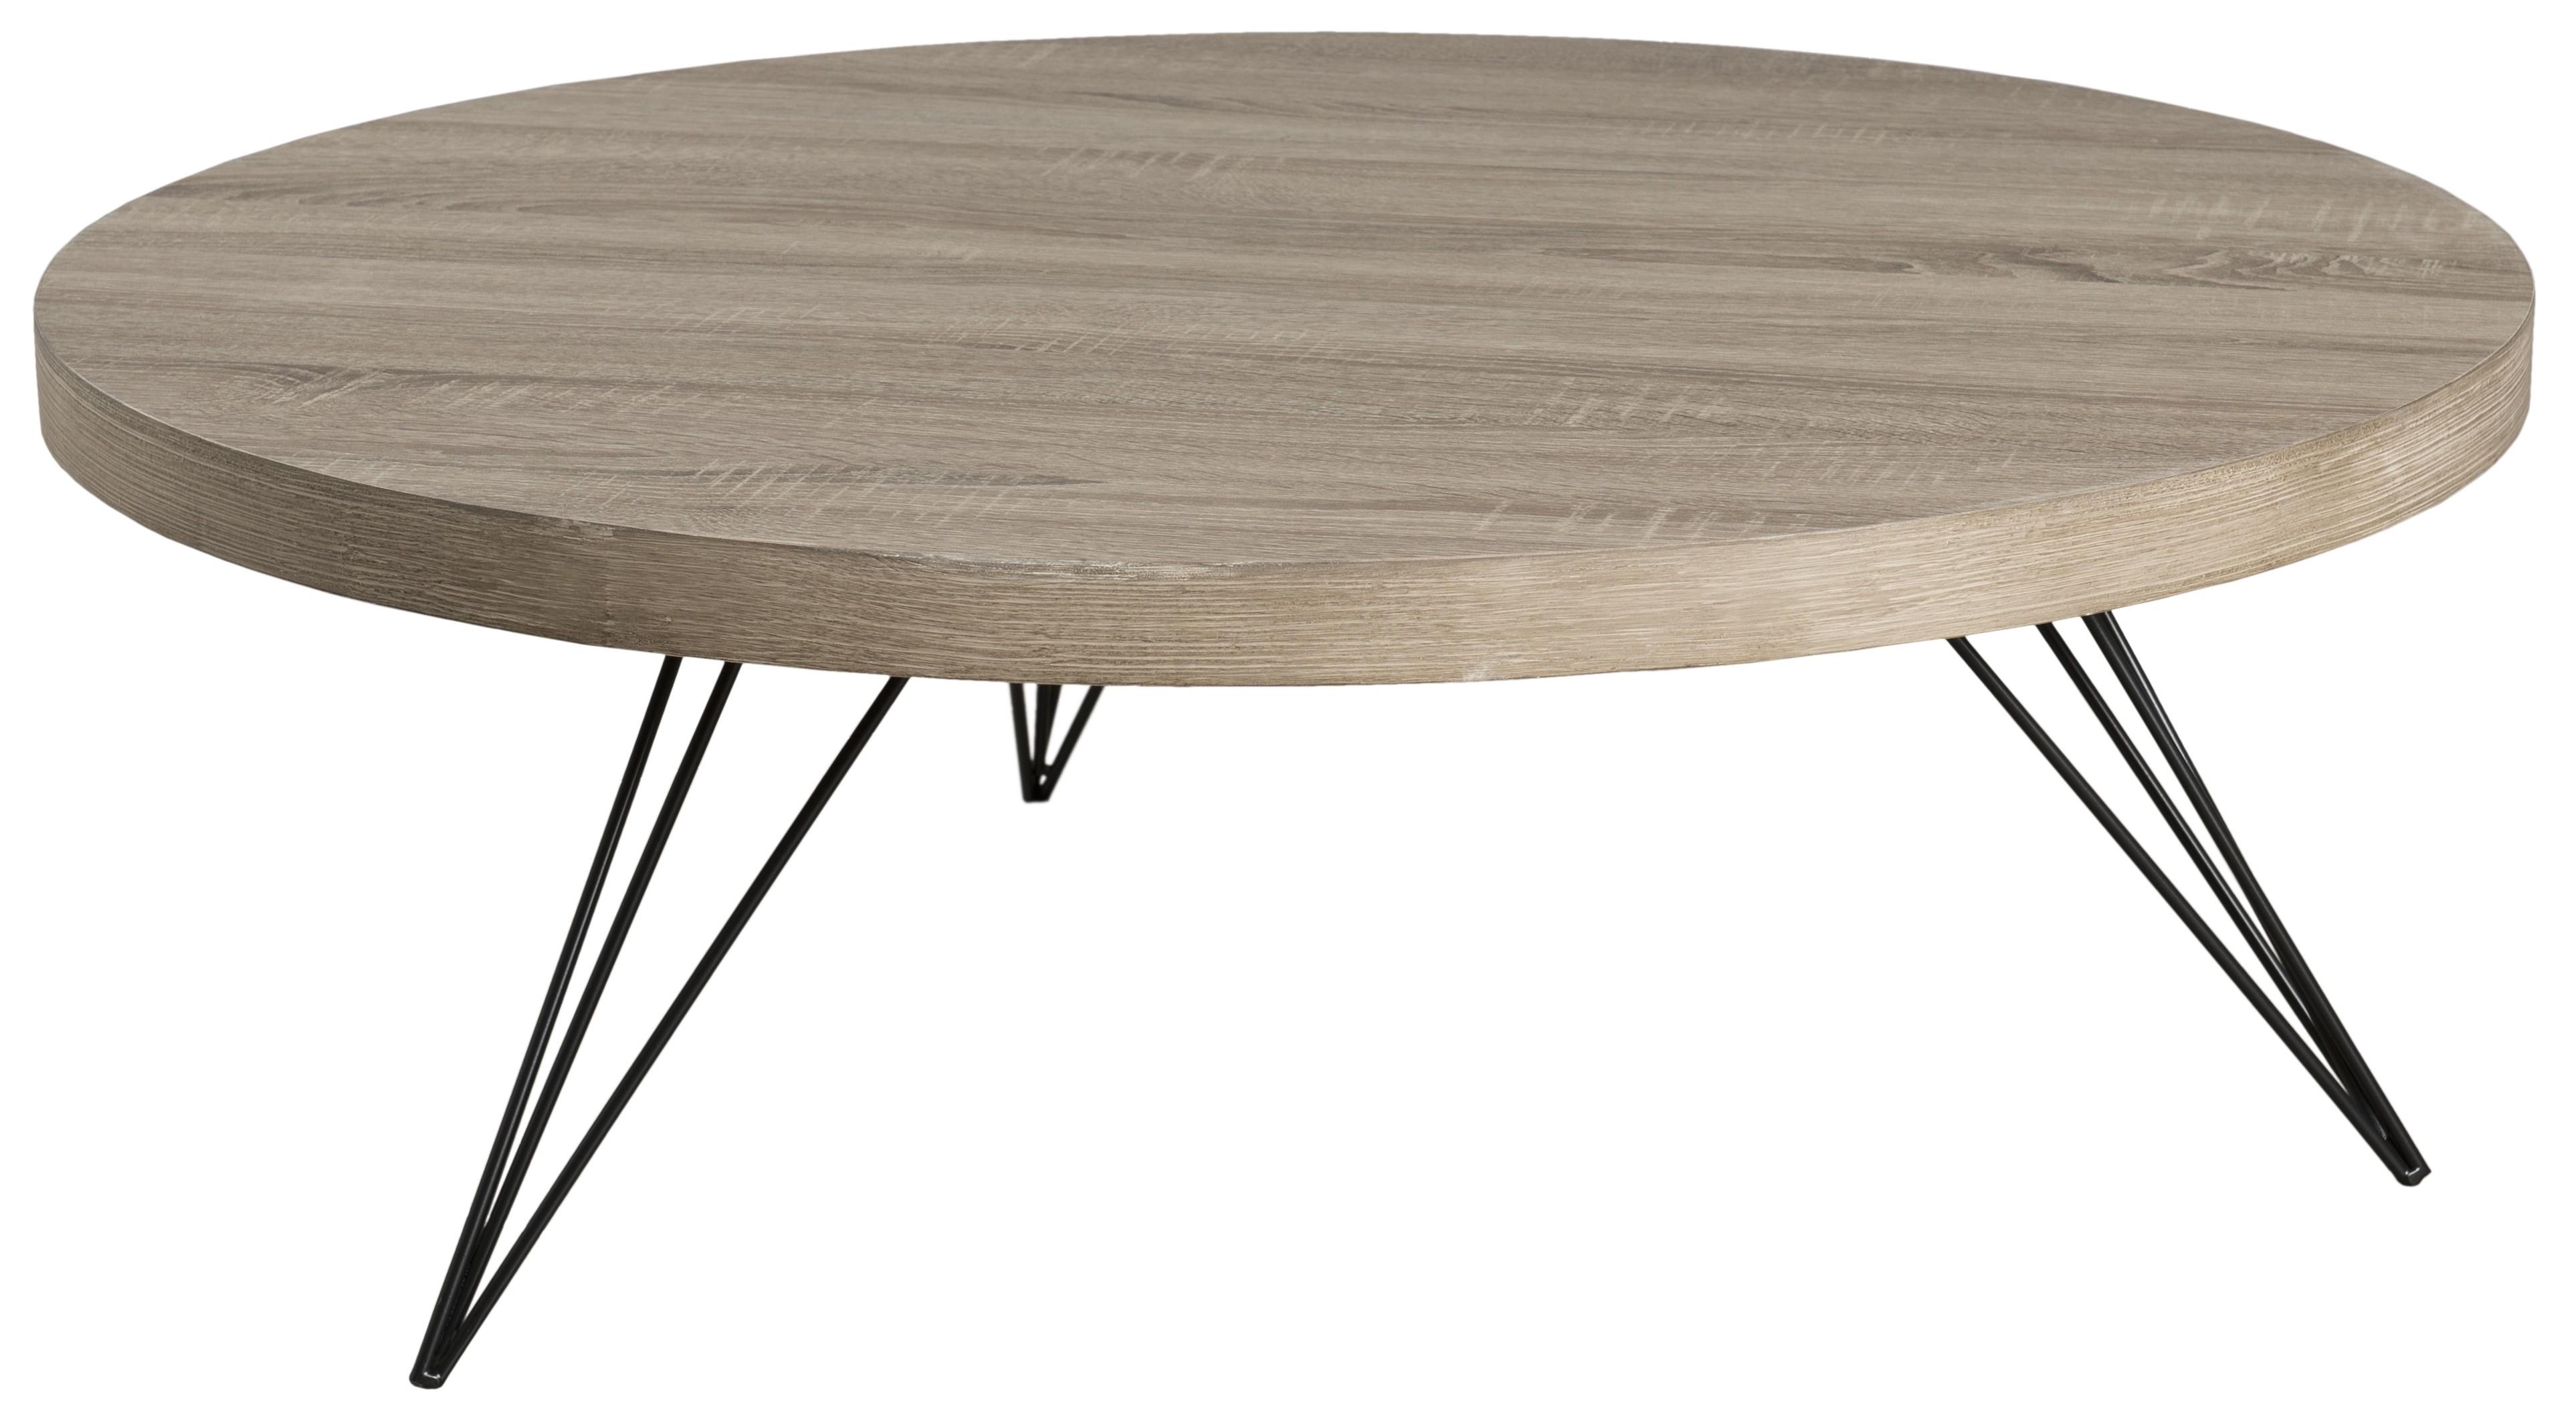 Table Basse Ronde Bois Et Fer Atwebsterfr Maison Et Mobilier